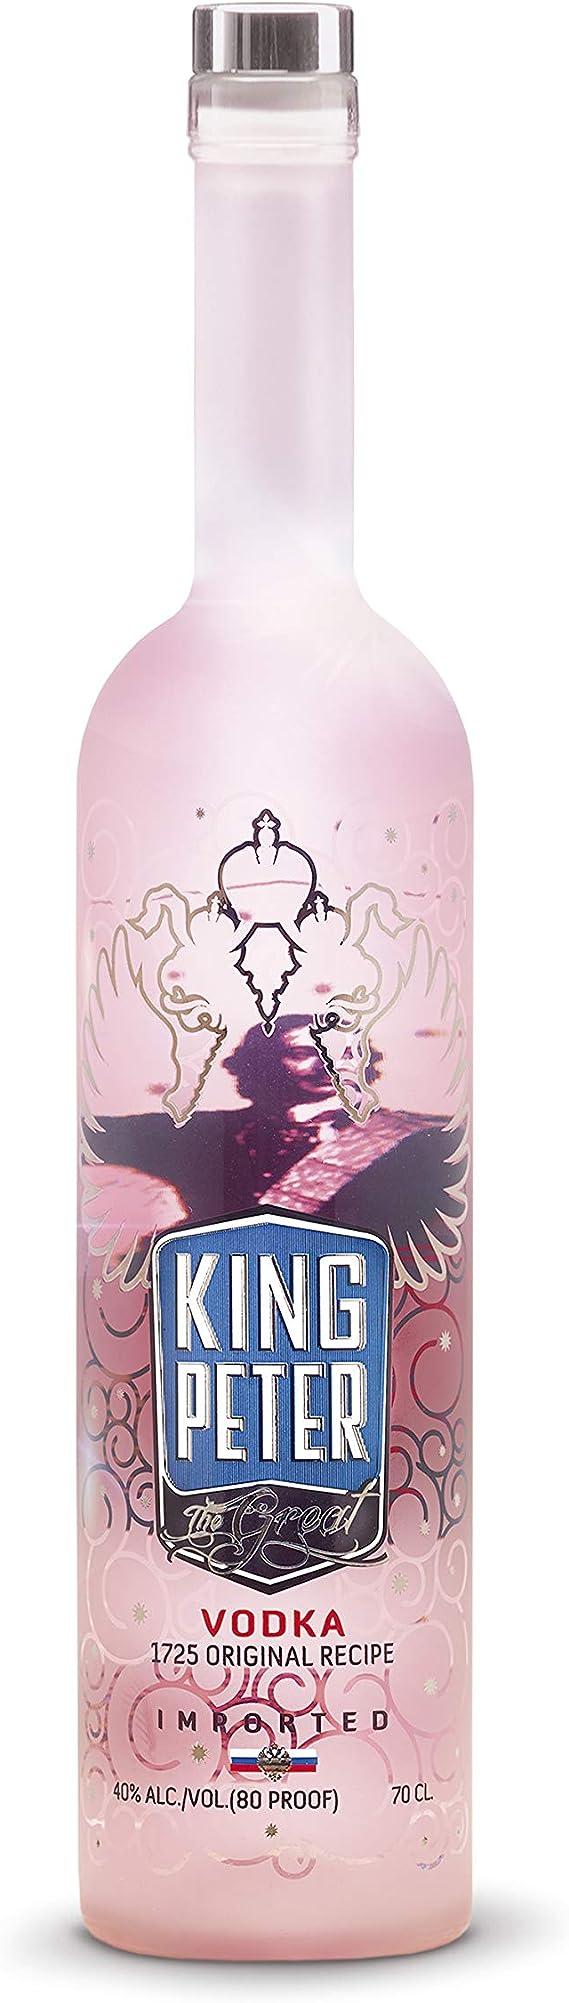 King Peter The Great Rosé Vodka Jeroboam Premium, 3 litros ...